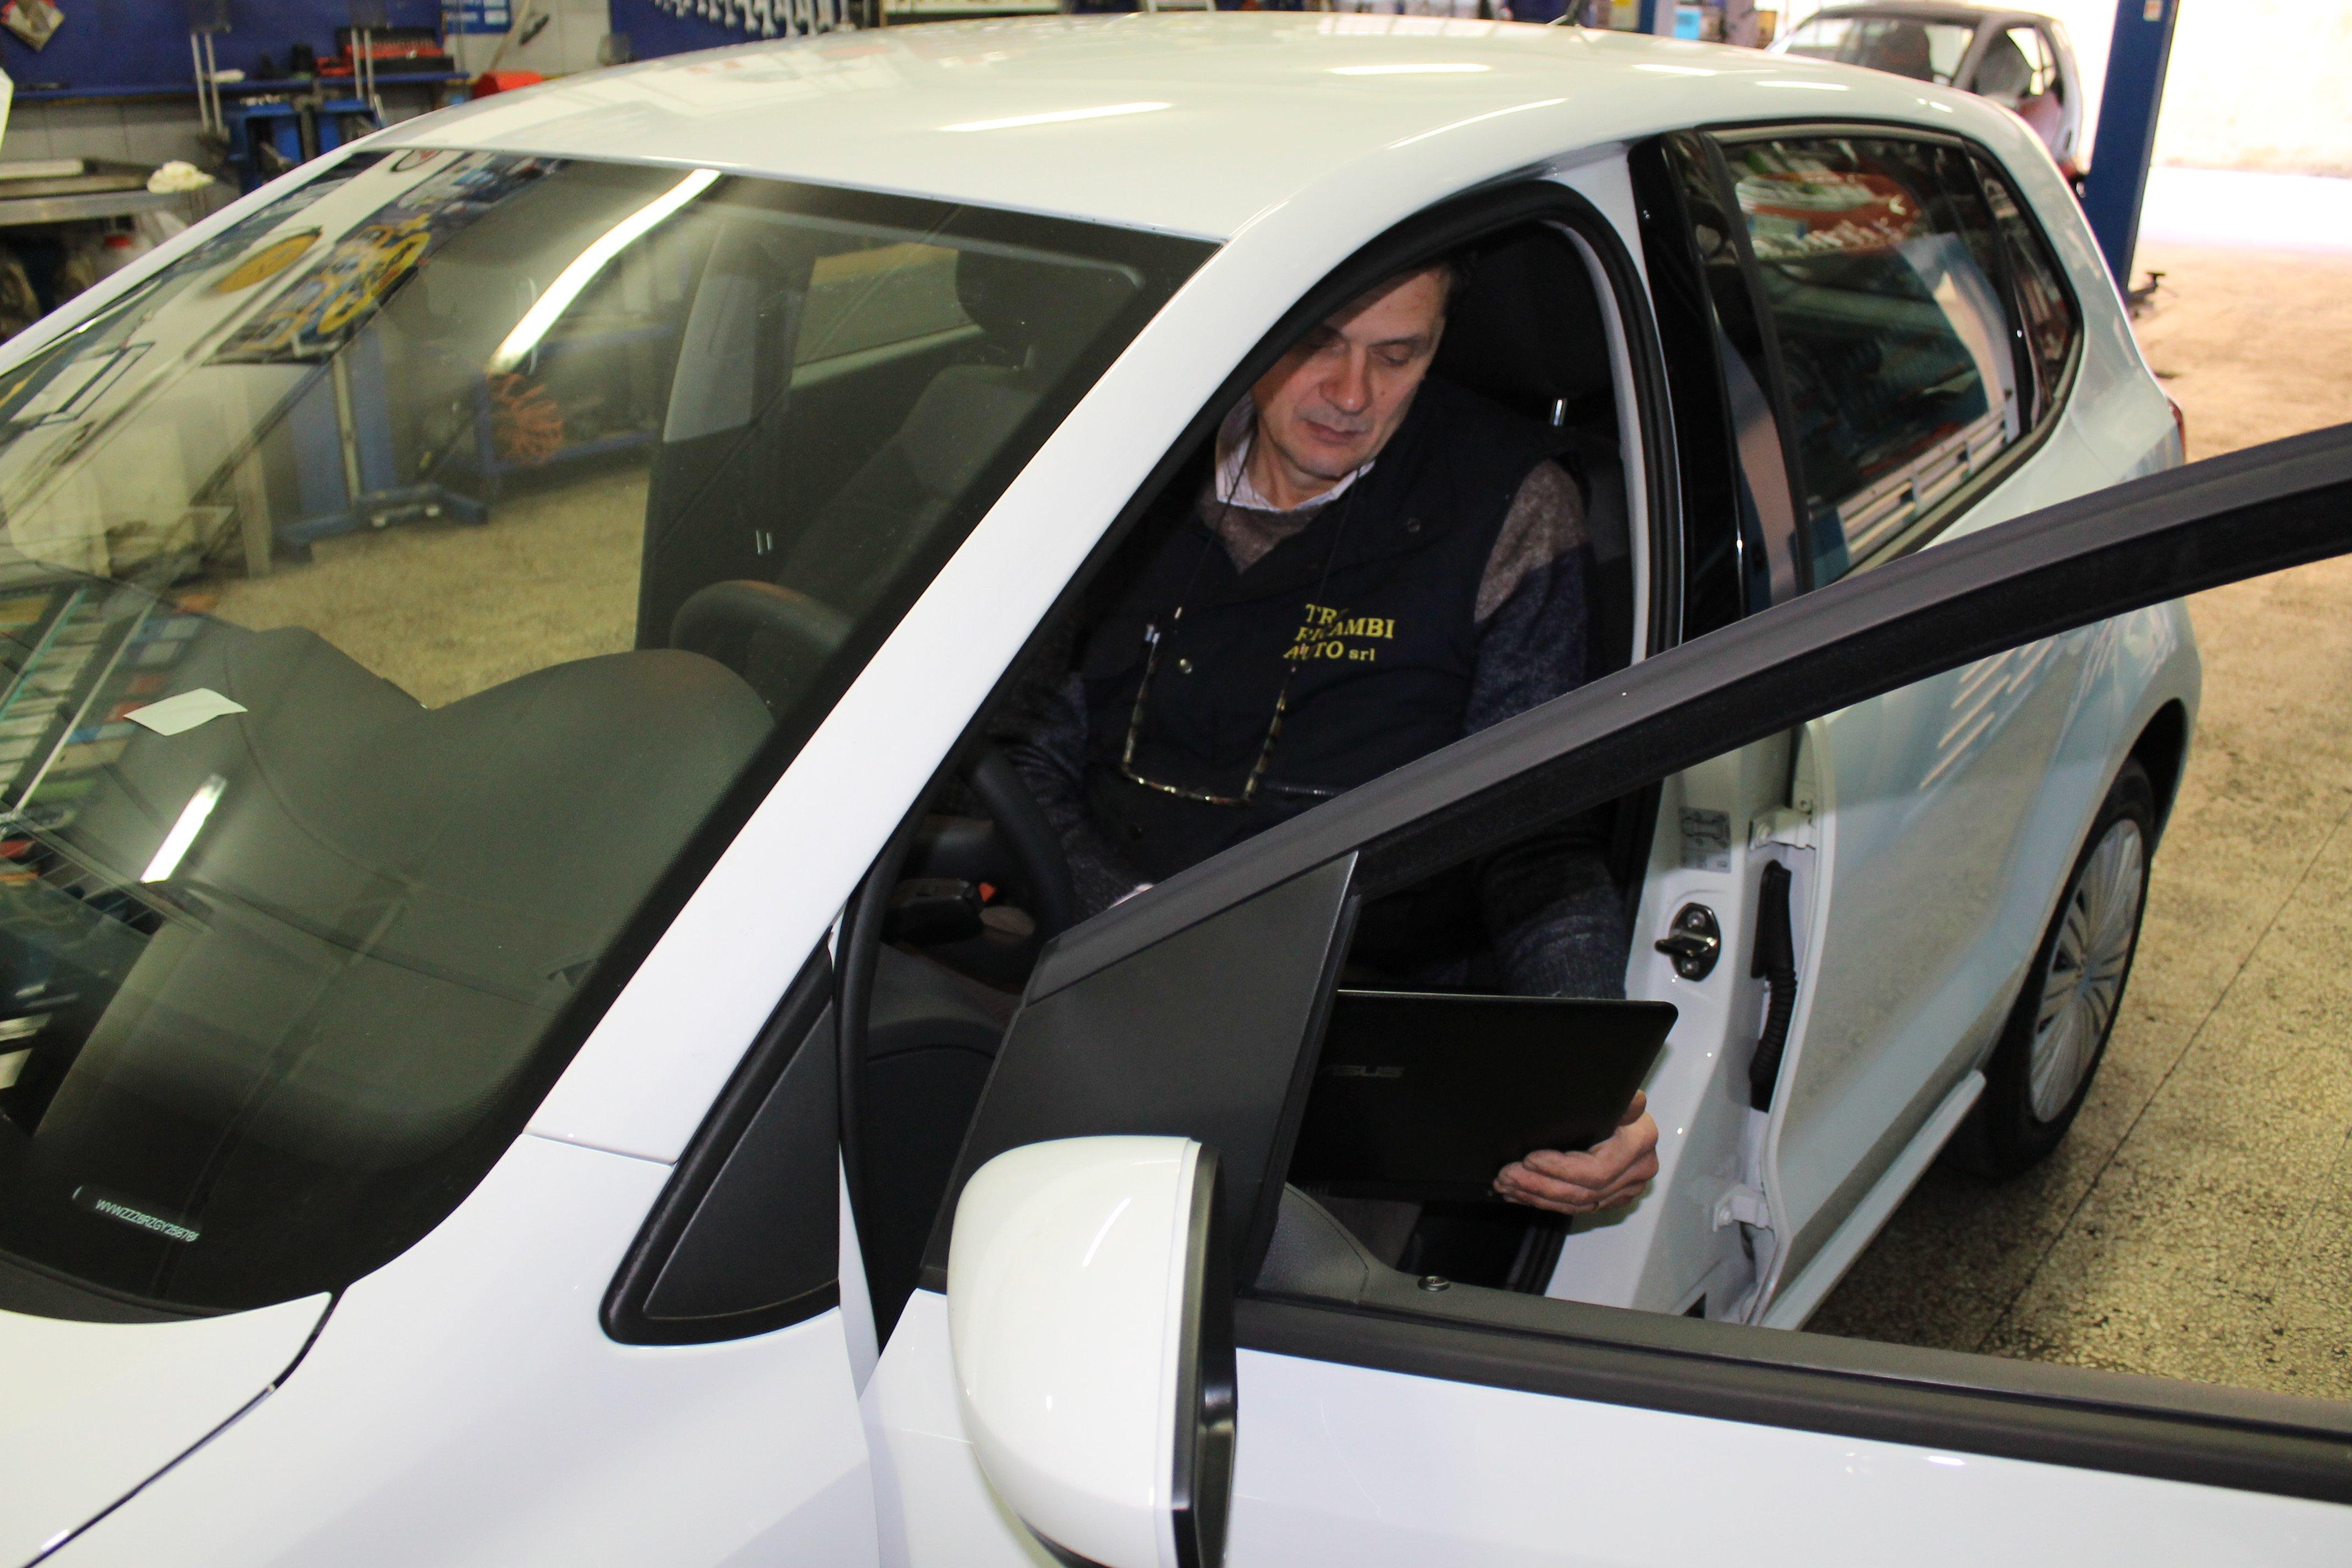 test elettronico auto